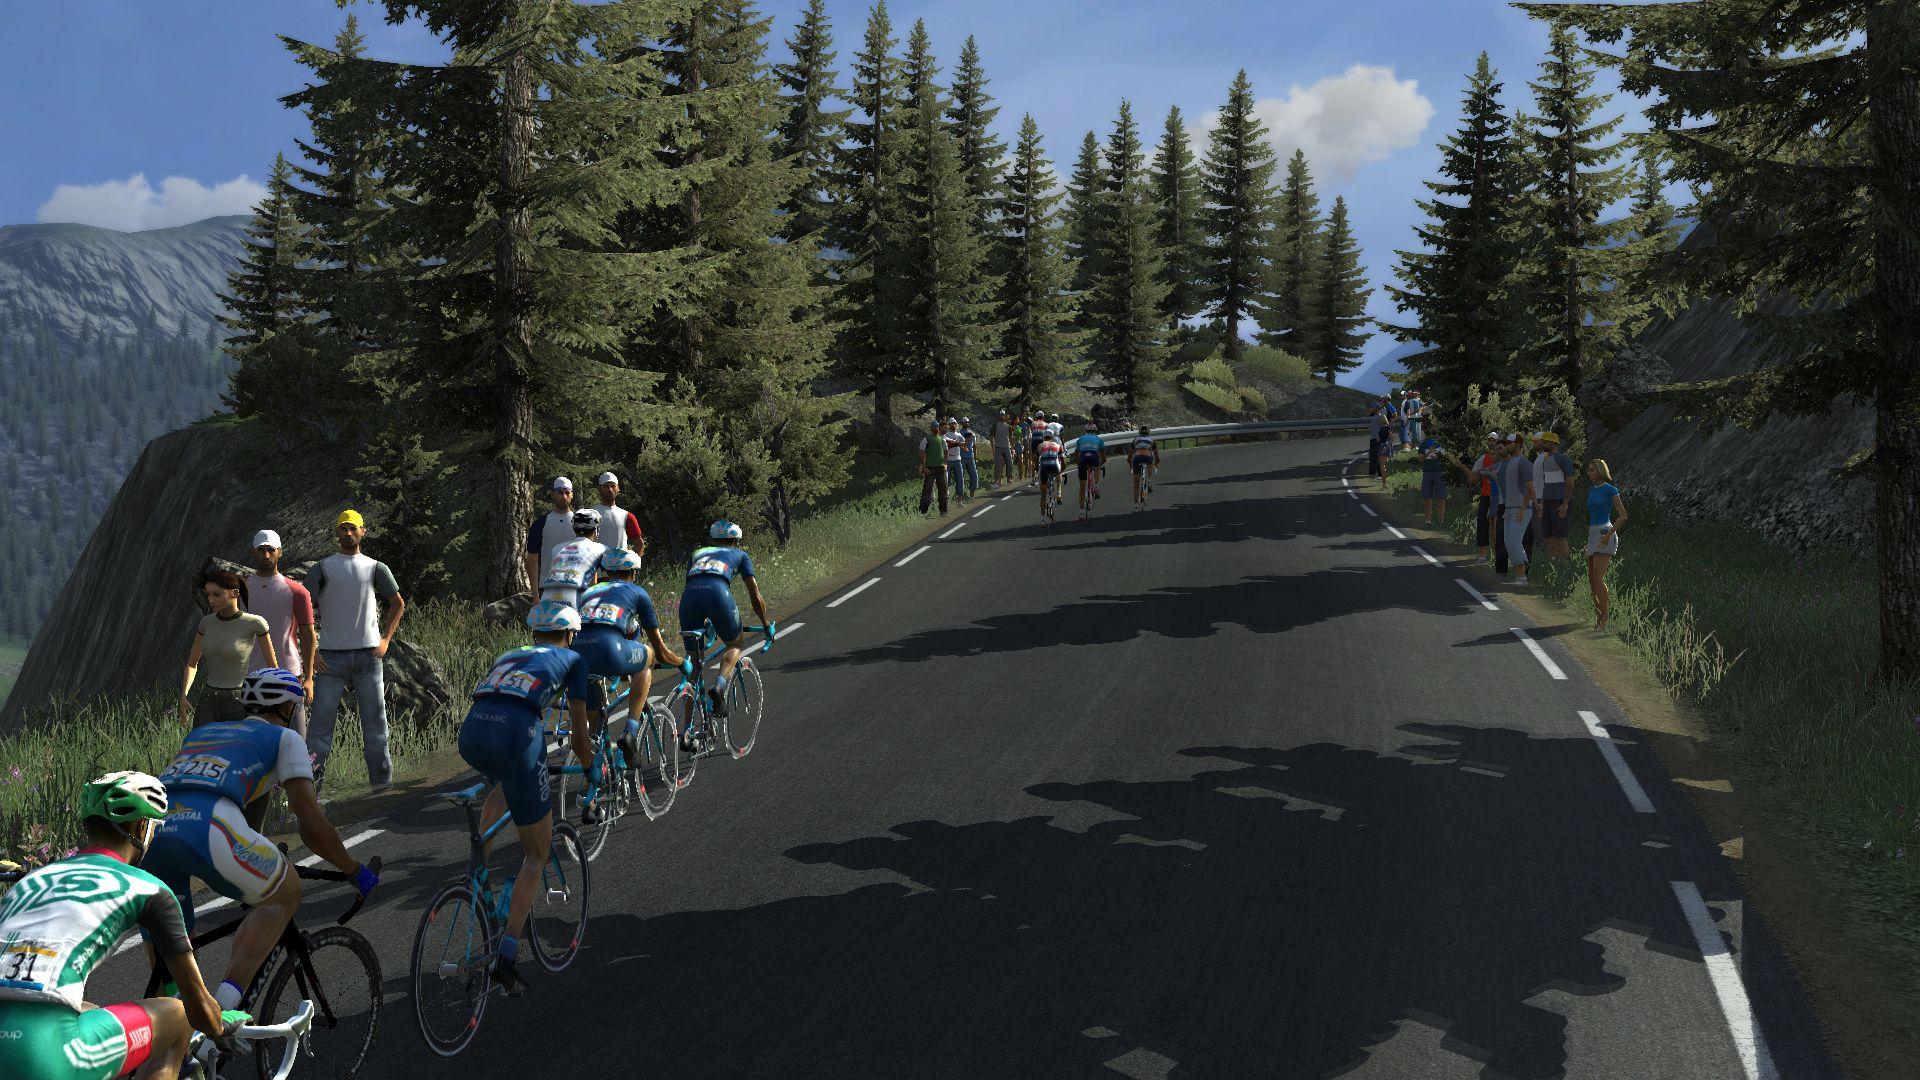 pcmdaily.com/images/mg/2017/Races/CT/Trentino/mg2017_trentino_02_PCM0087.jpg